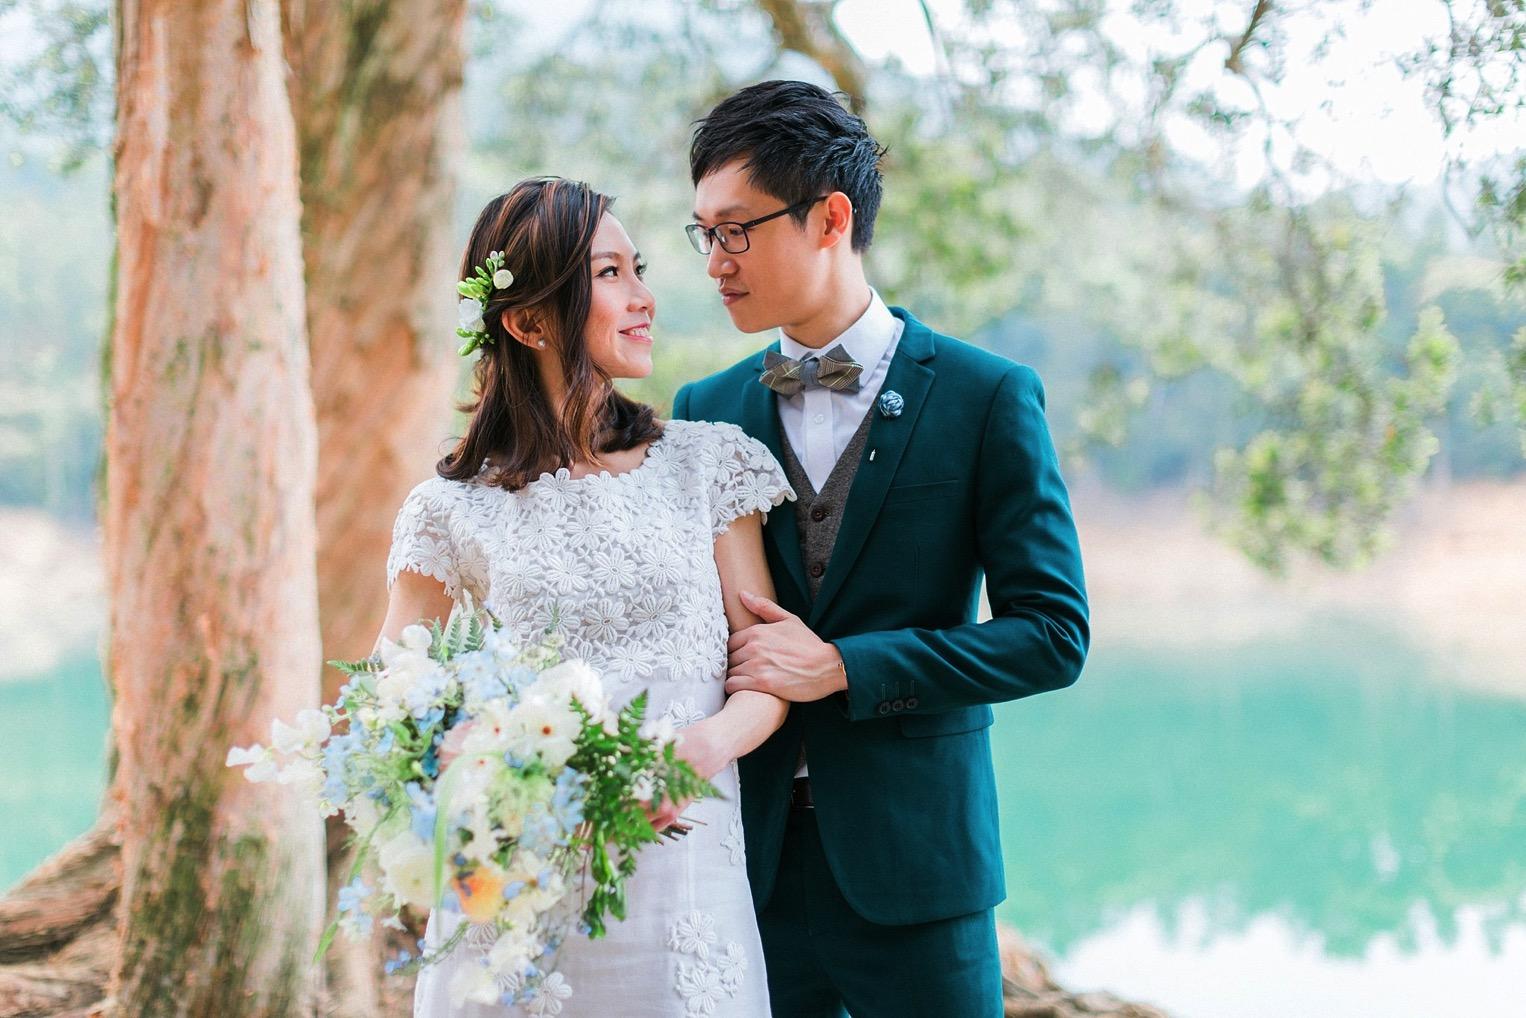 French Grey Photography Hong Kong Prewedding13